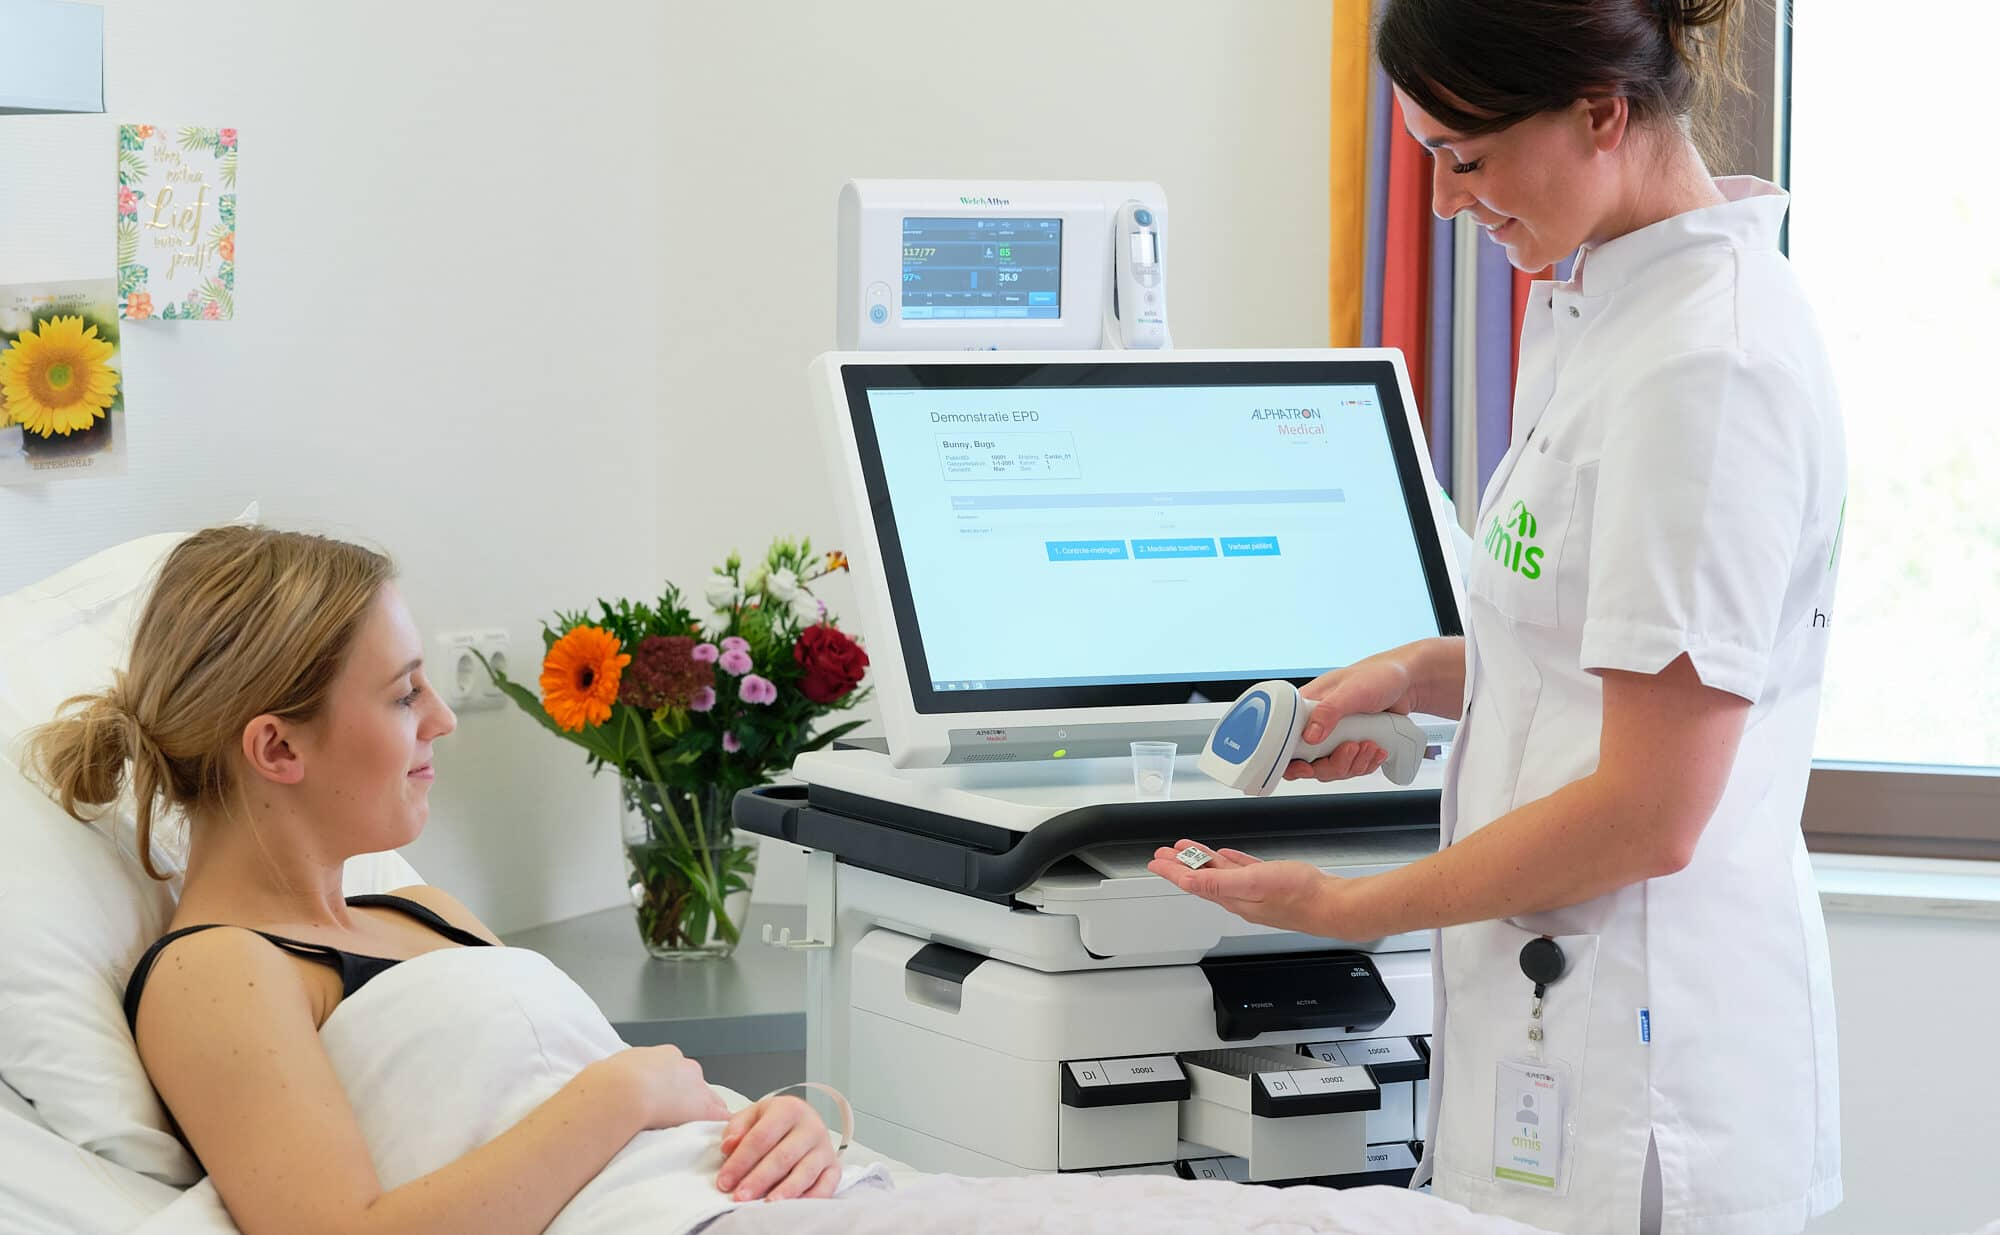 nurse medication scan patient medication dispensing device